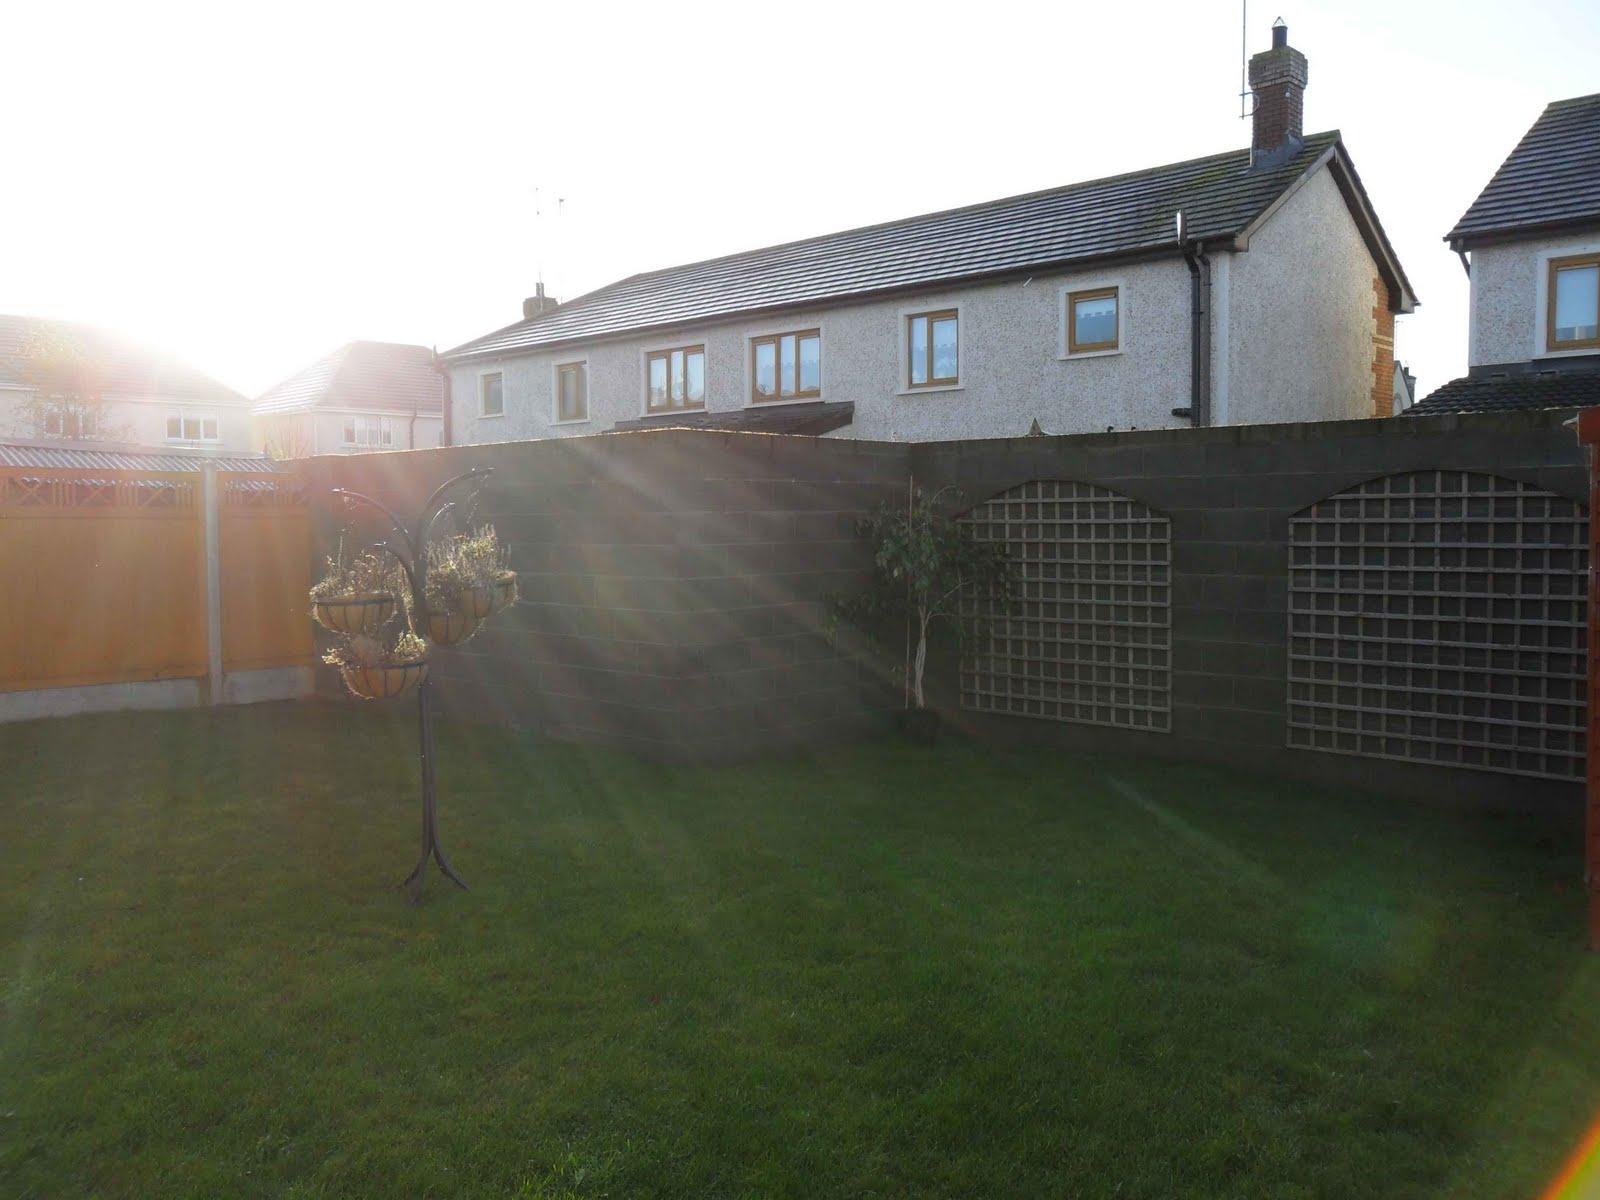 Cold grey boundary walls in a garden Grange Rath, Drogheda